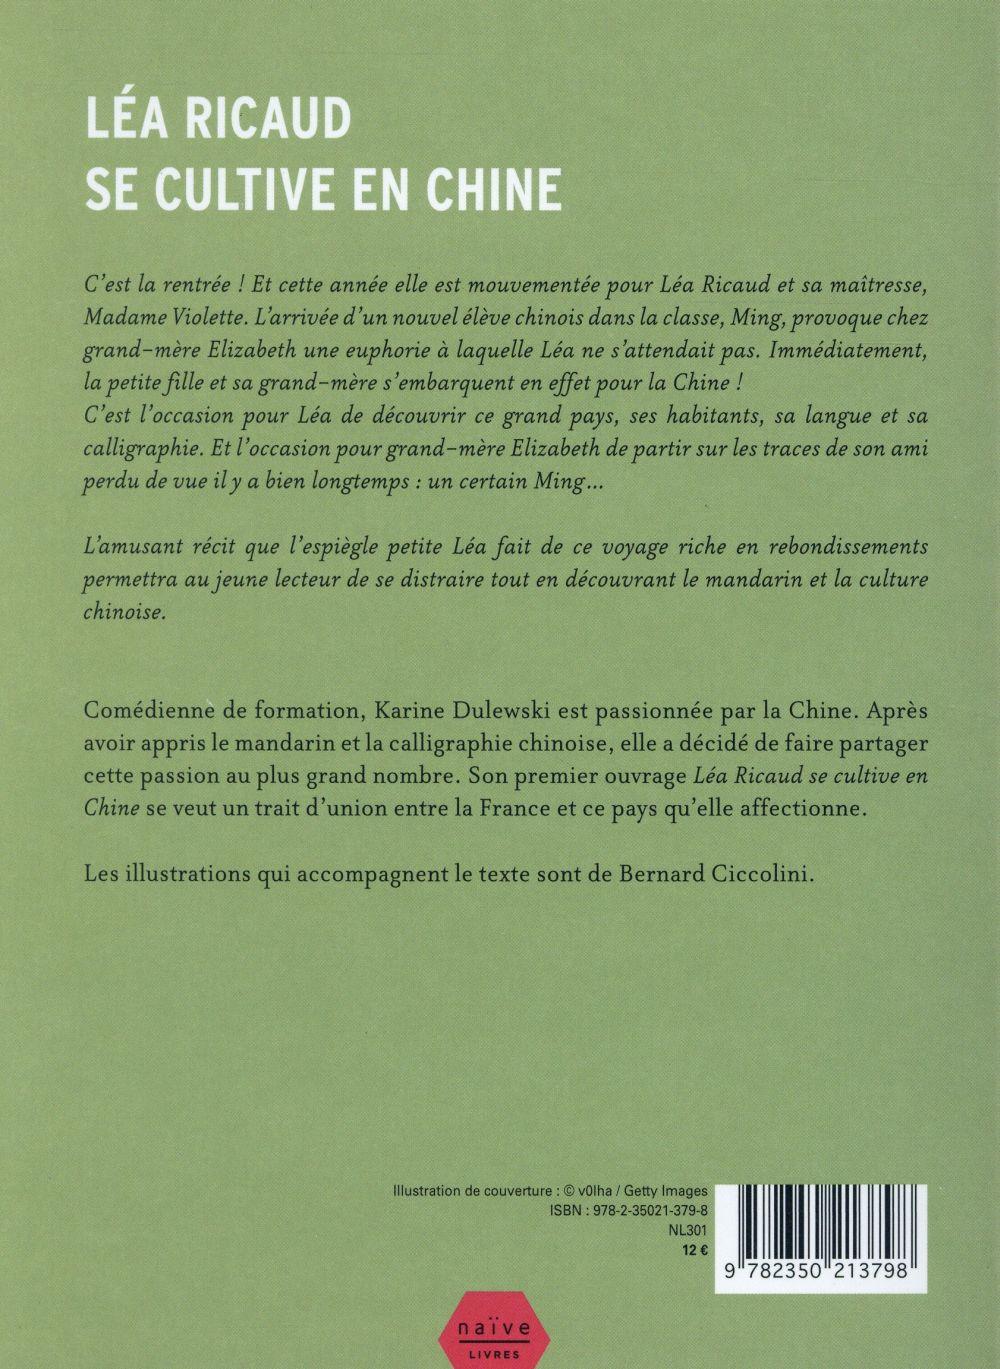 Léa Ricaud se cultive en Chine